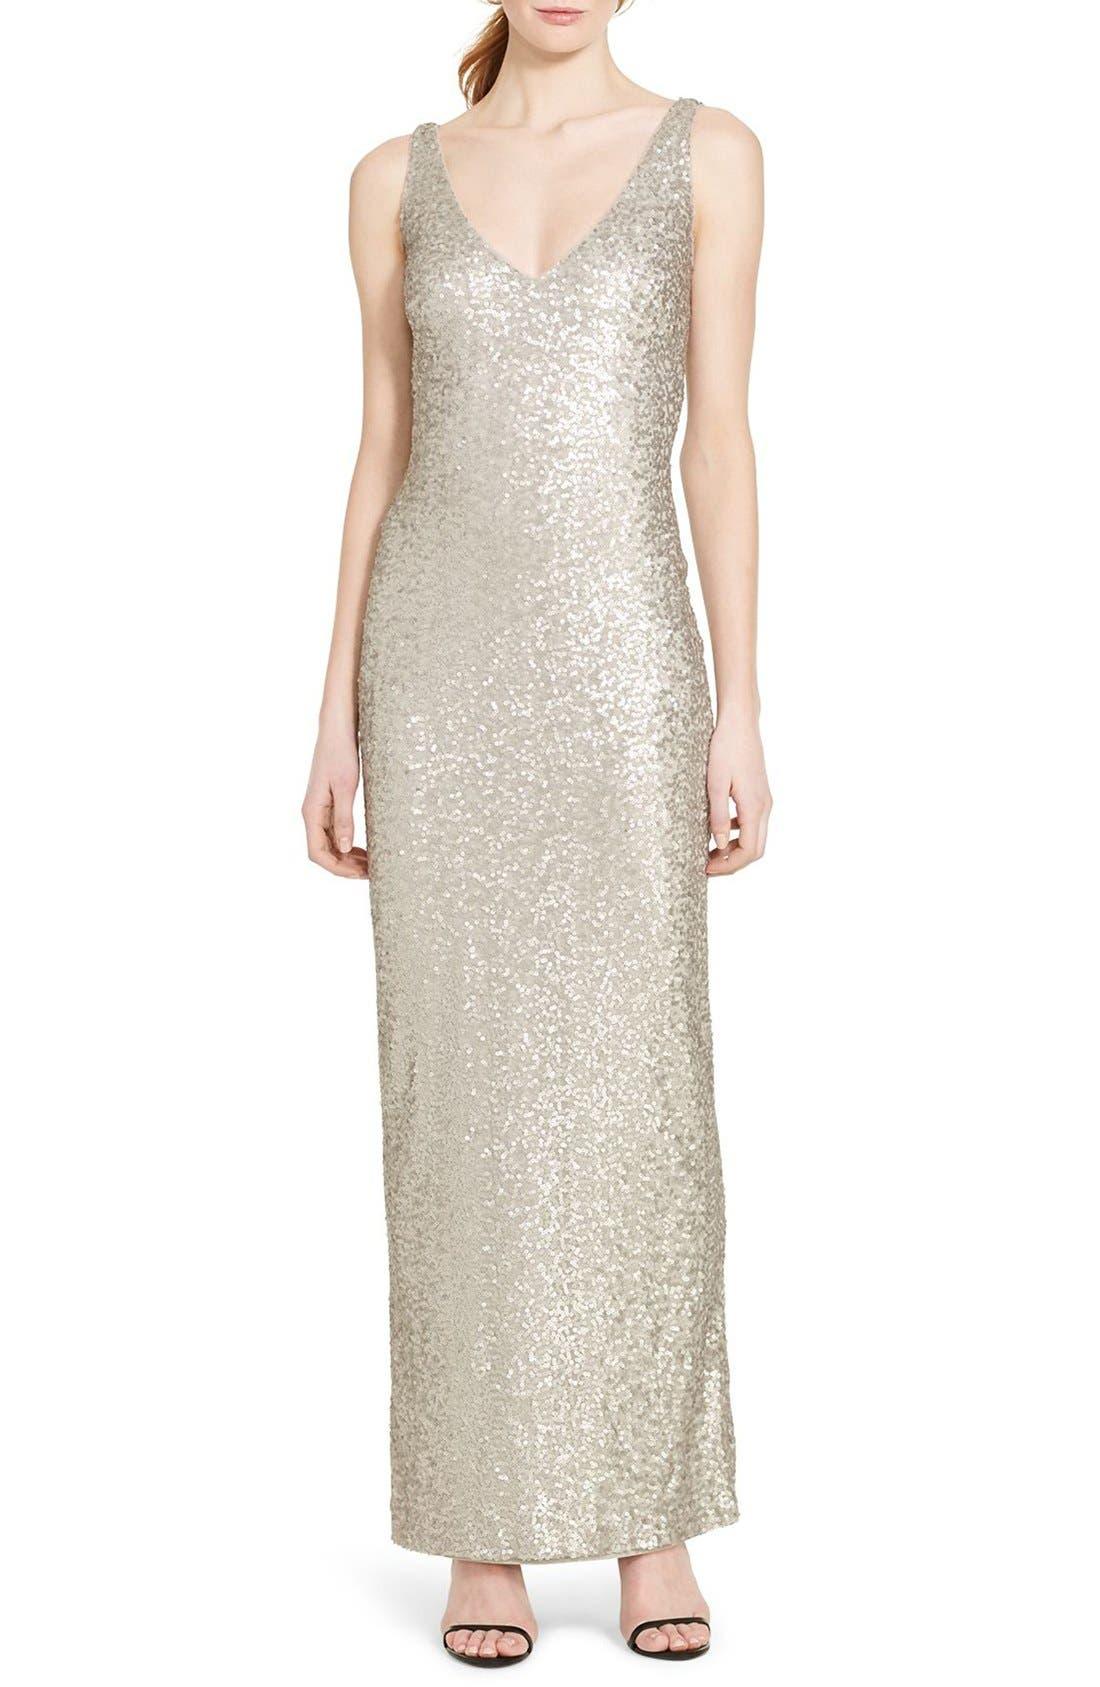 Sequin Mesh Gown,                             Main thumbnail 1, color,                             040